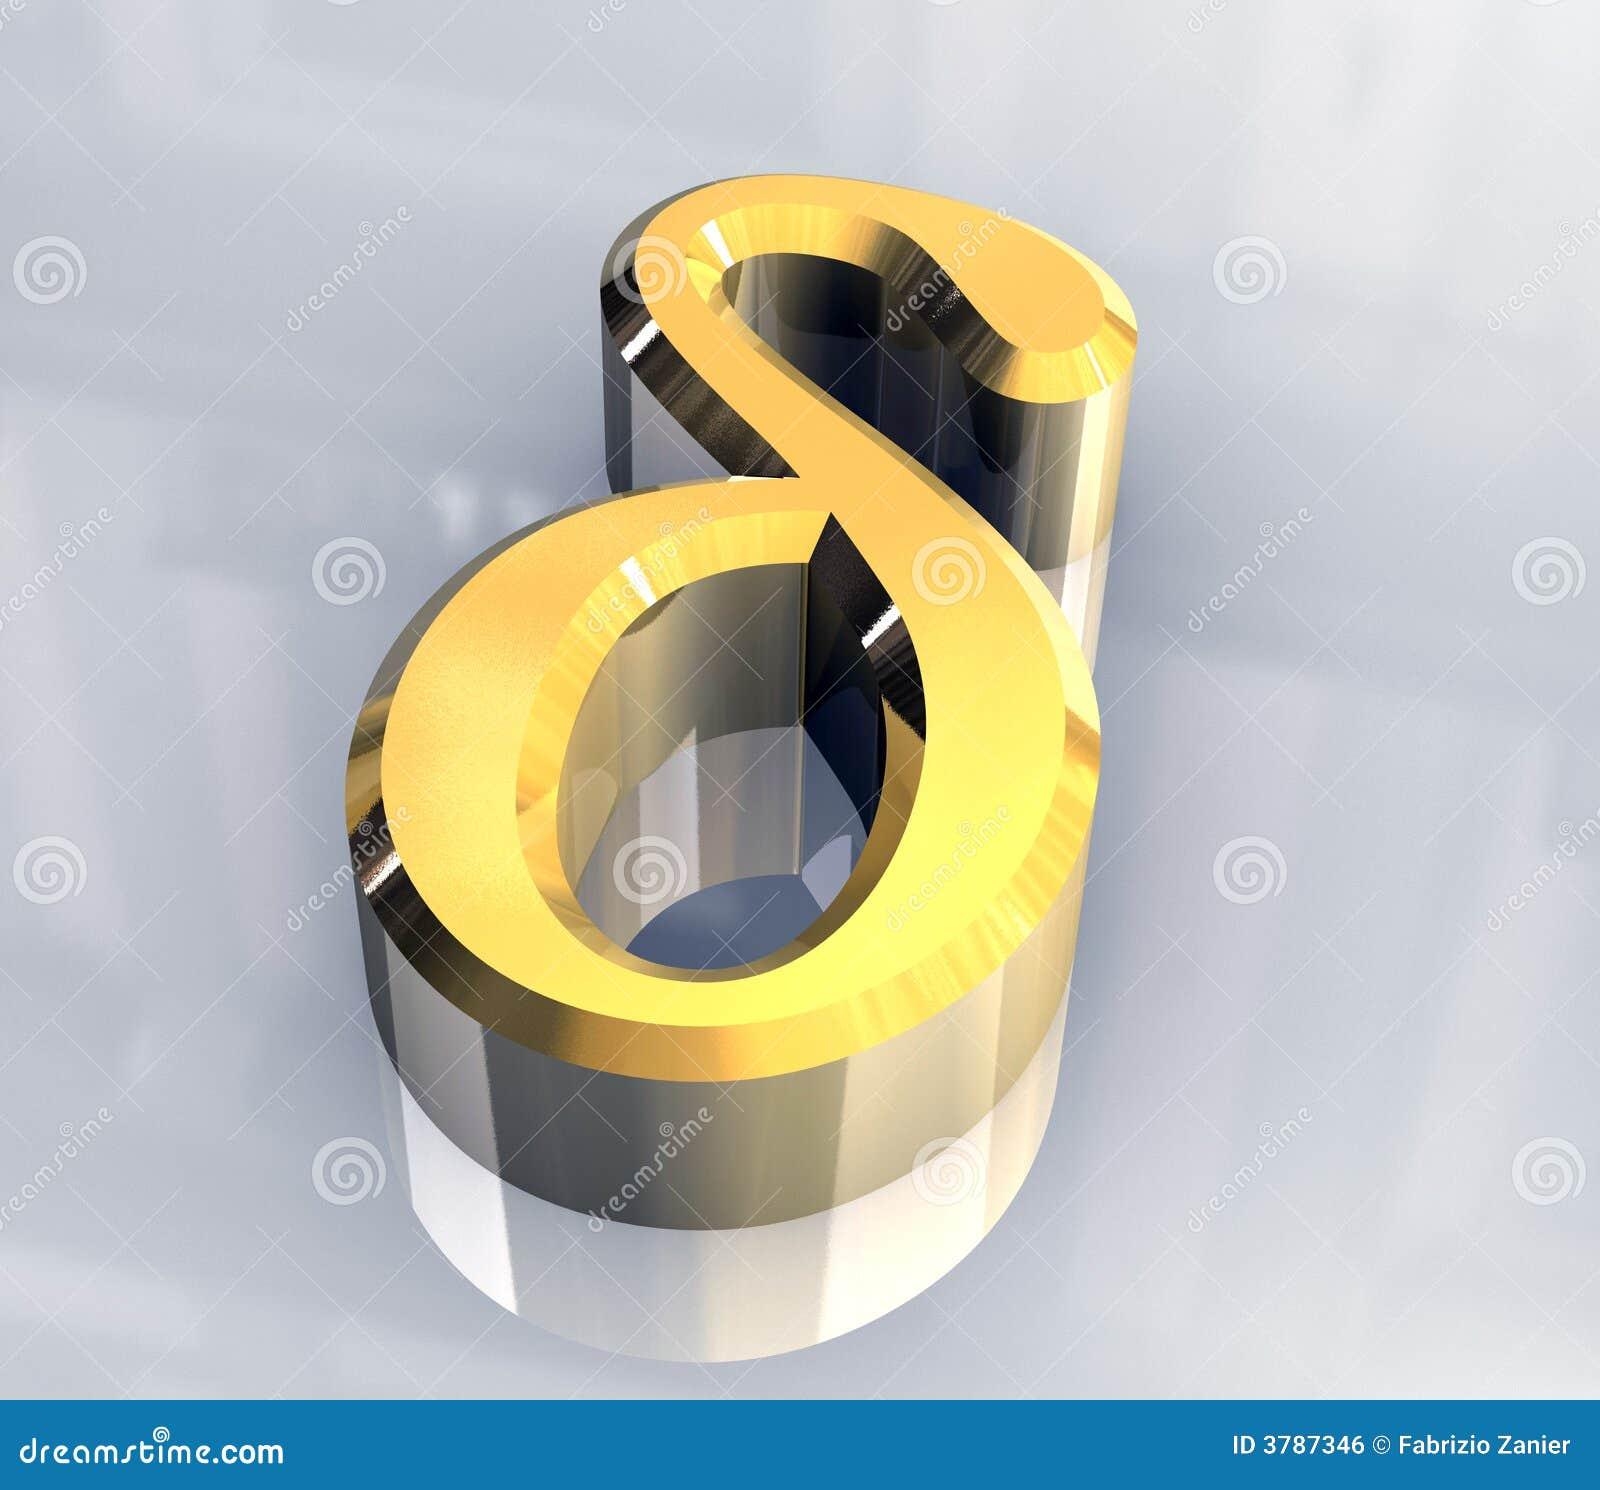 Delta symbol in gold 3d stock illustration image of black 3787346 royalty free stock photo buycottarizona